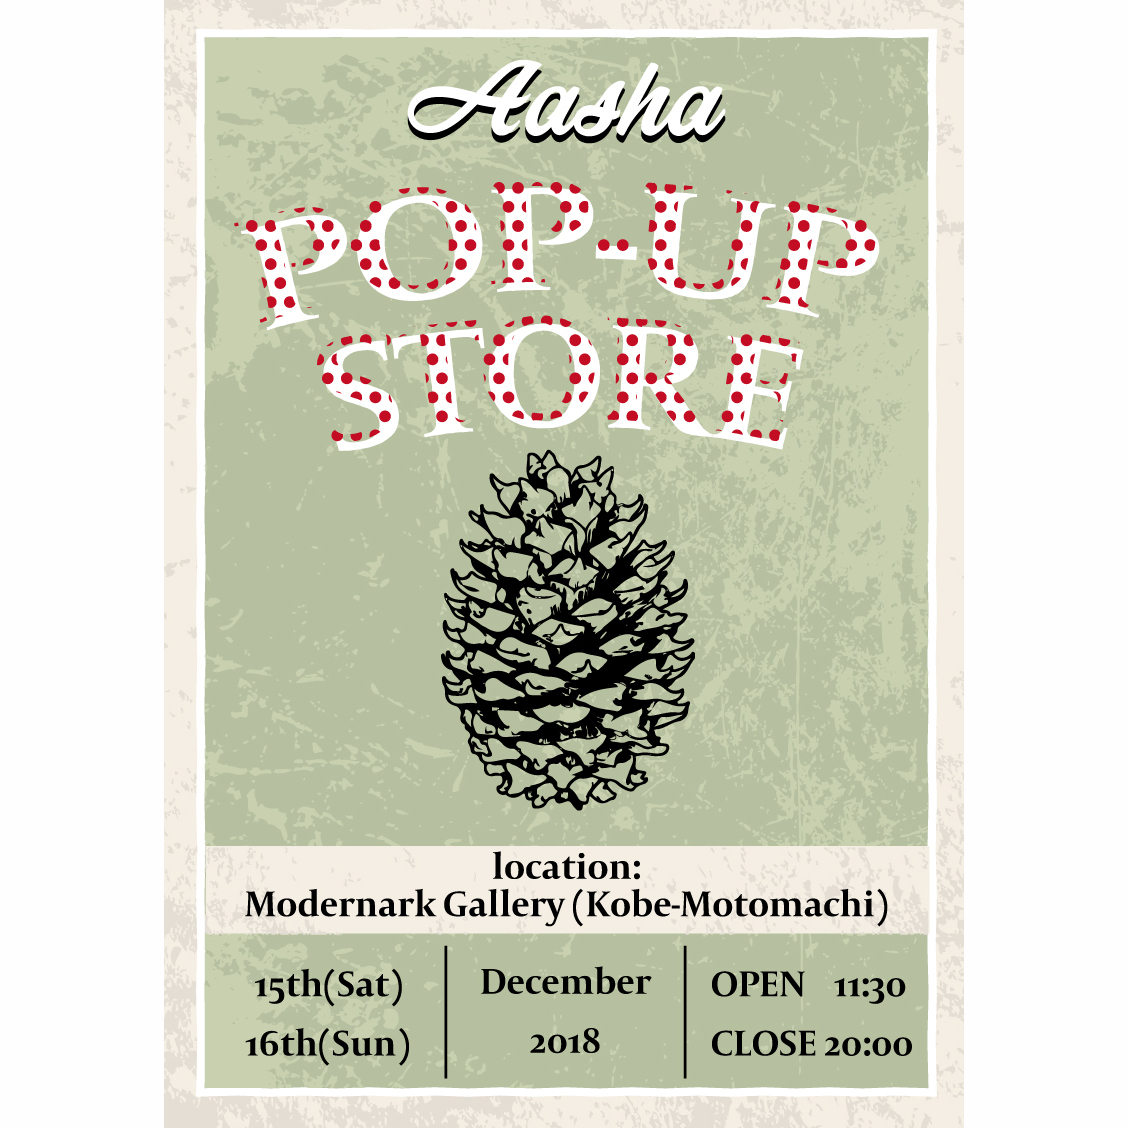 Aasha Popup Store @ Modernark Gallery